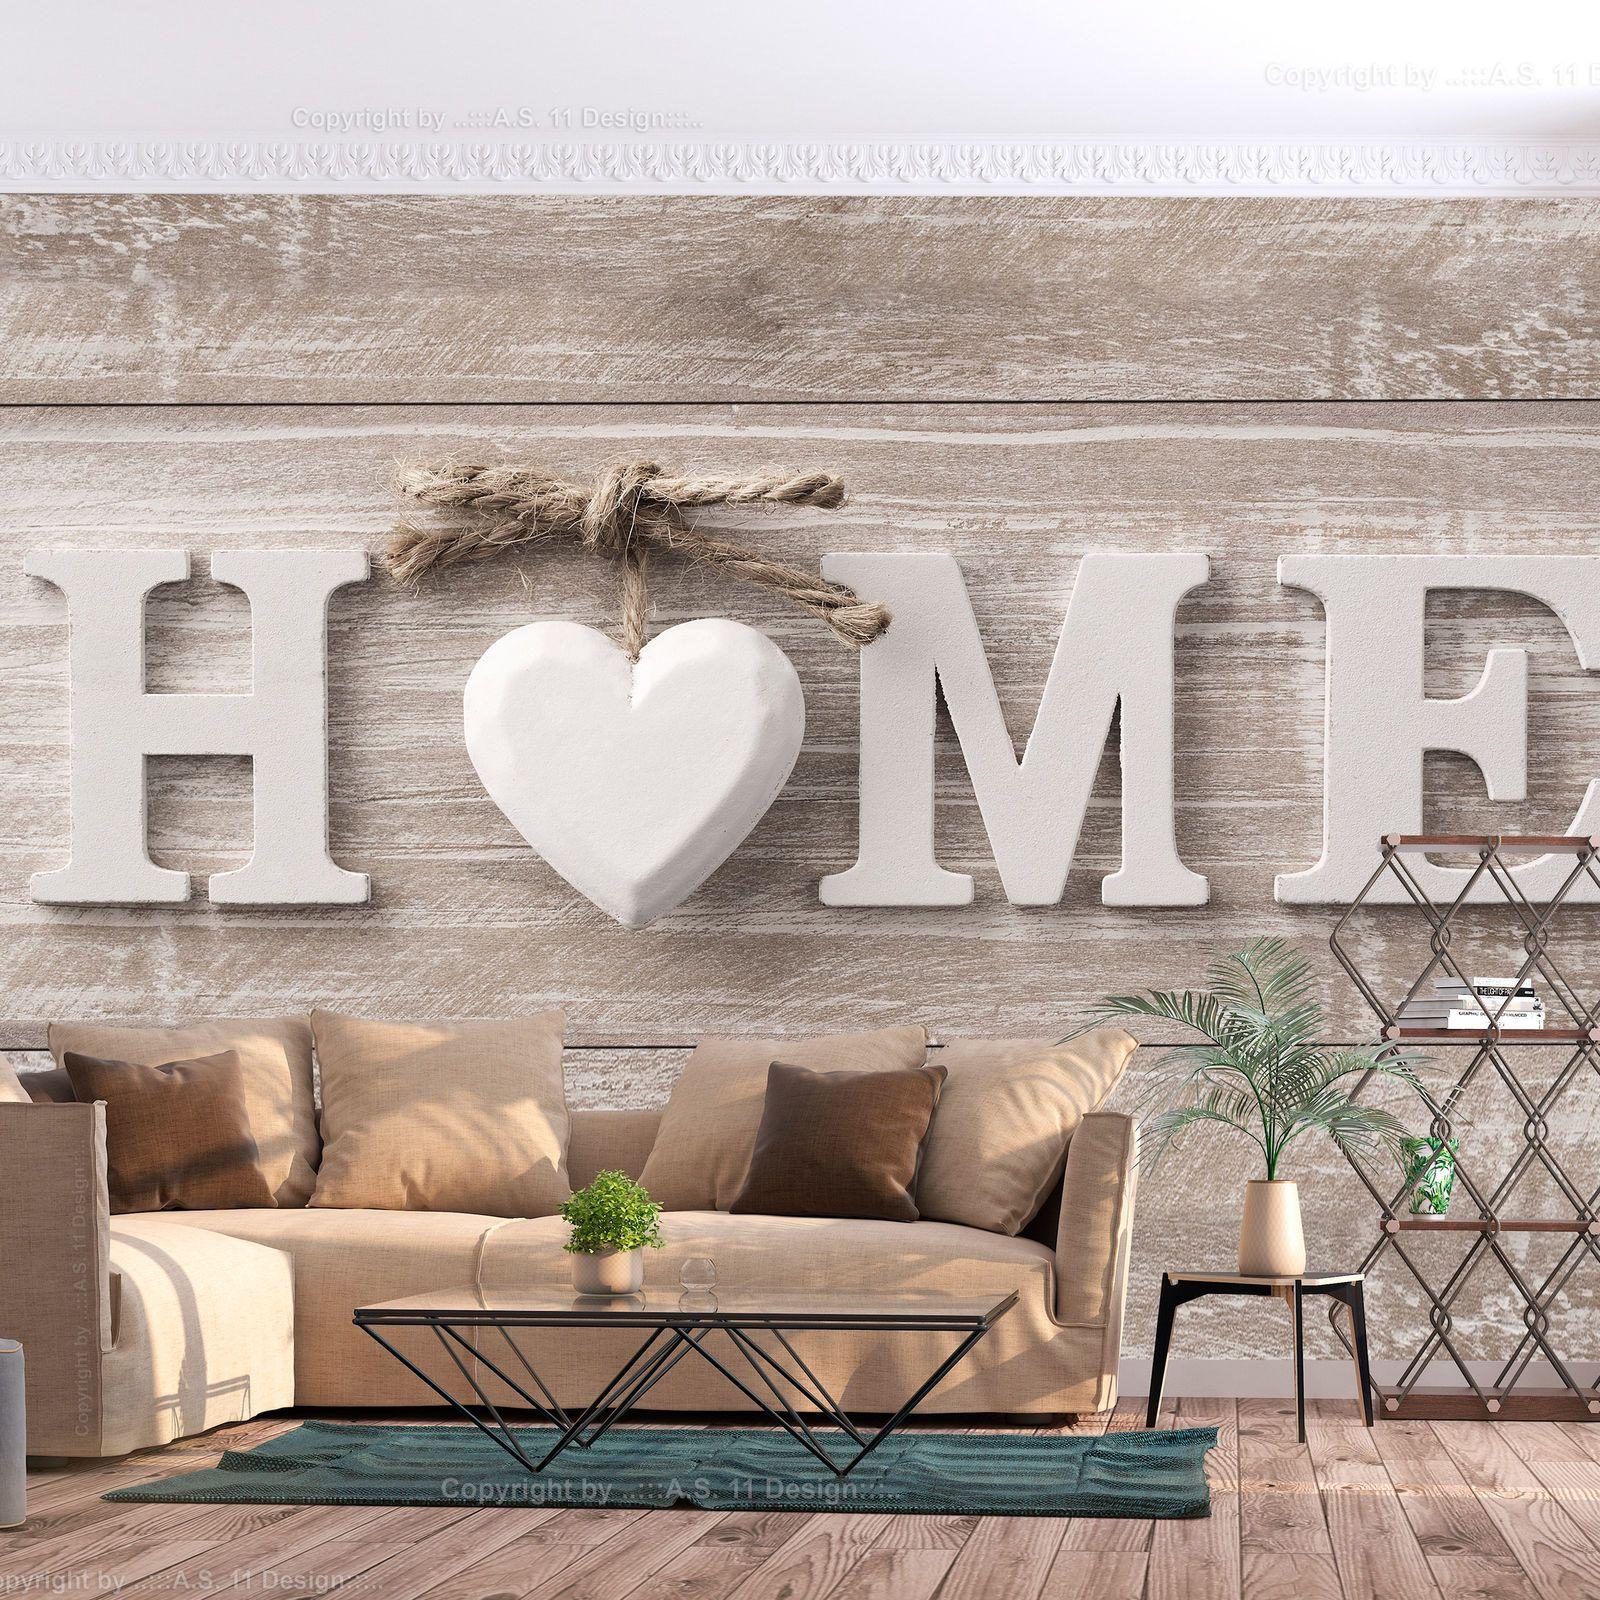 Holz tapete schlafzimmer for Fototapete fur dachschrage